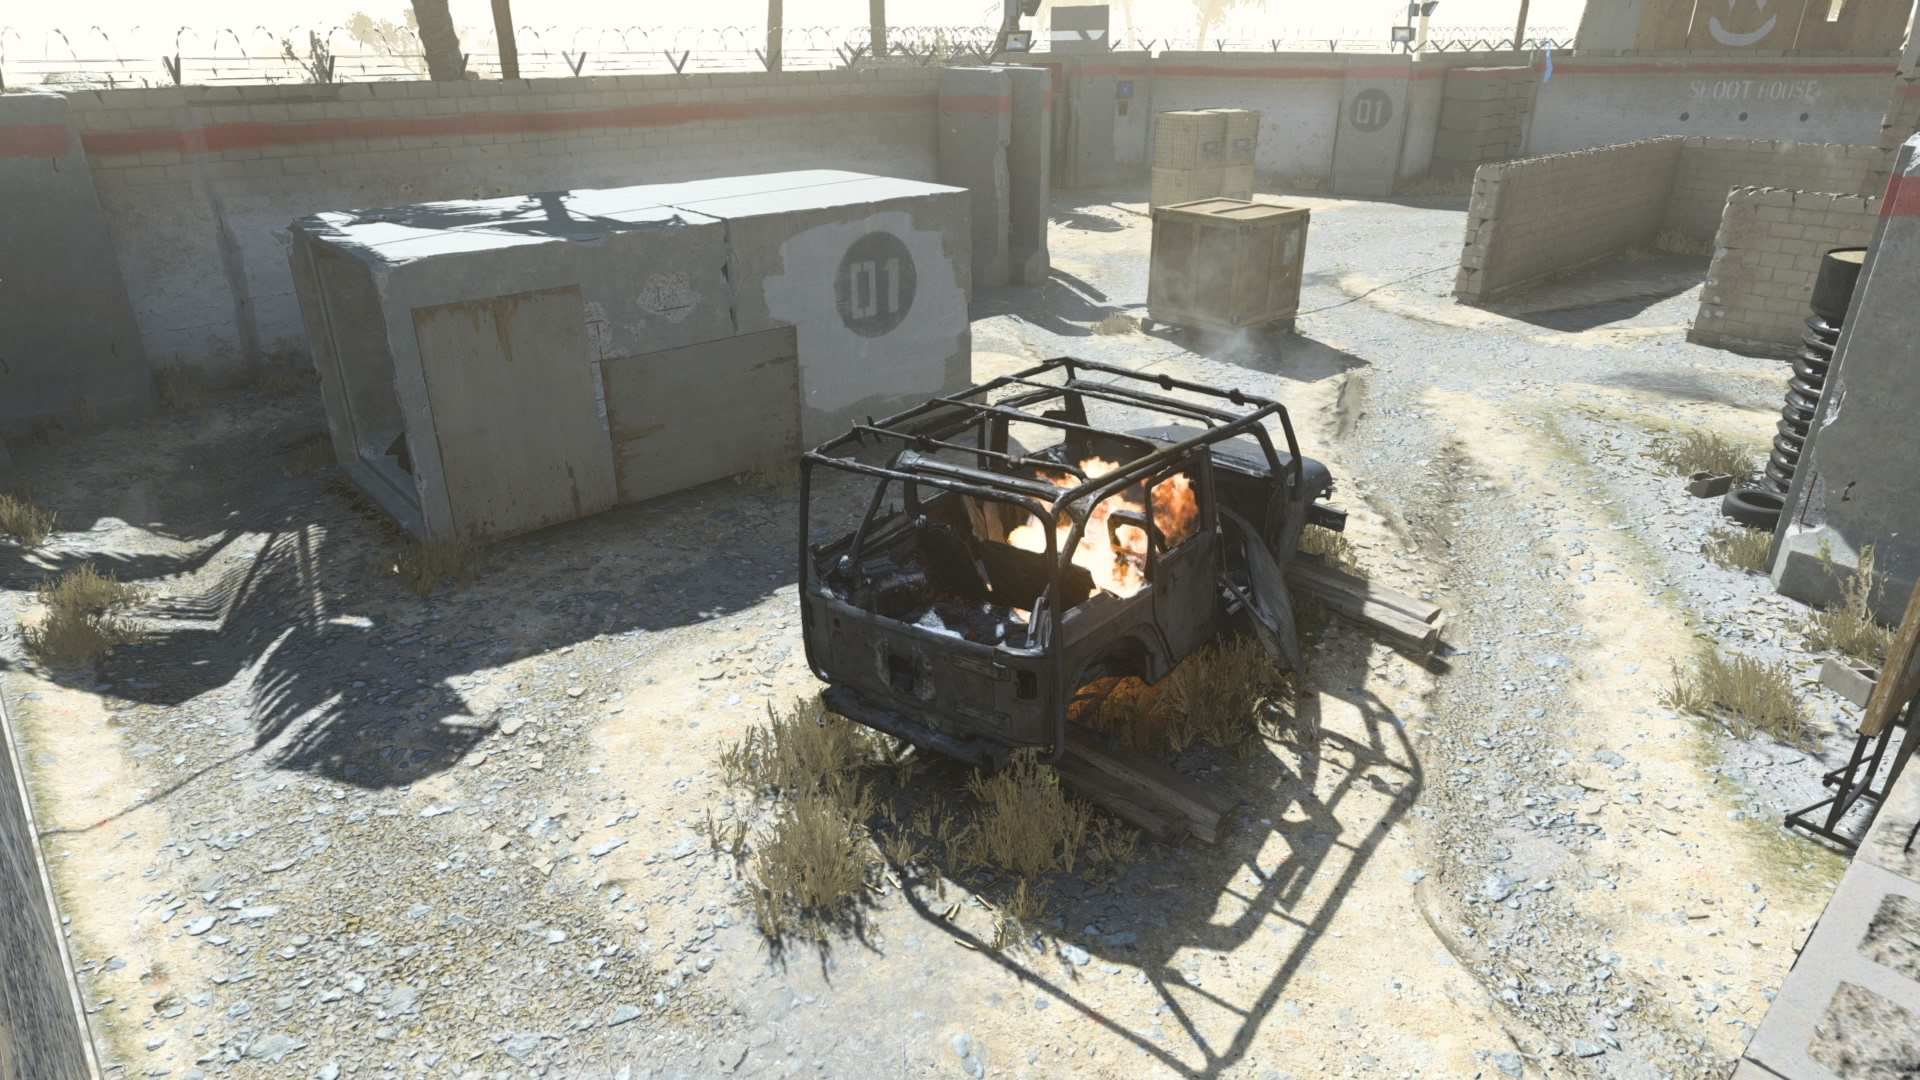 Modern Warfare® Tactical Map Intel: Shoot House on outdoor shooting range designs, building a gun room designs, indoor gun range designs, shooting barricade designs, shooting house designs,